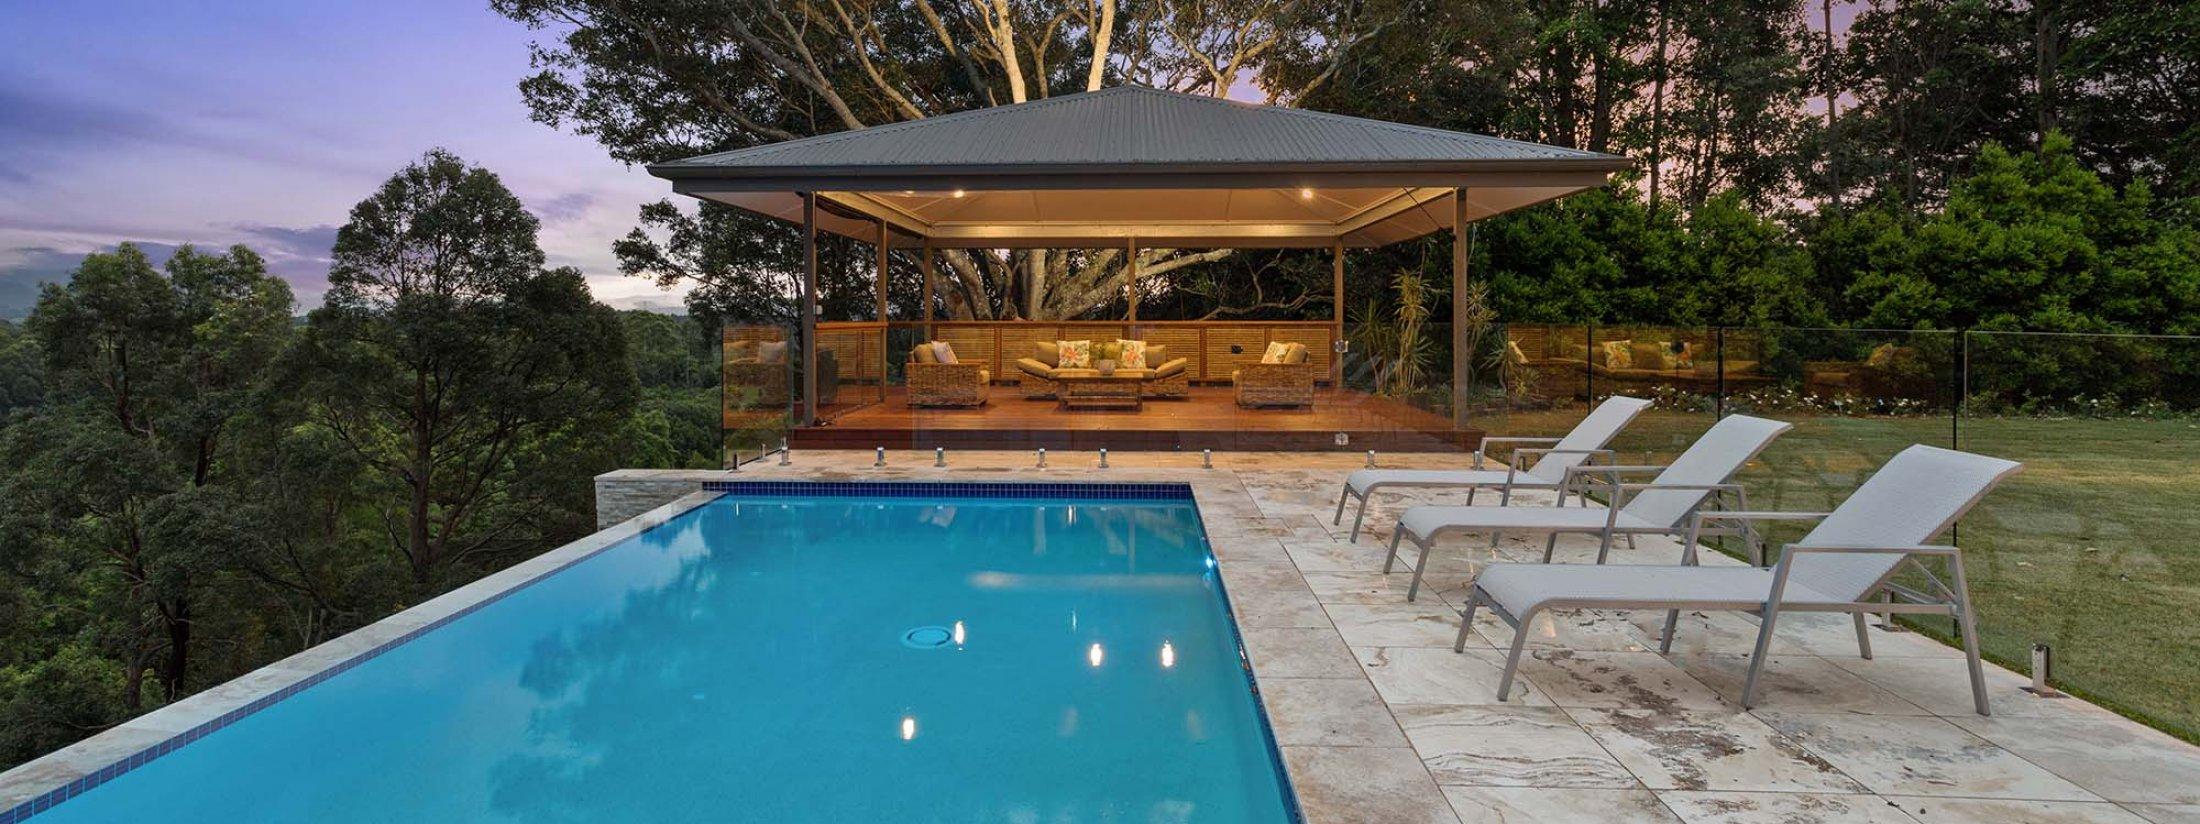 Serene Myocum - Byron Bay - Pool and Cabana